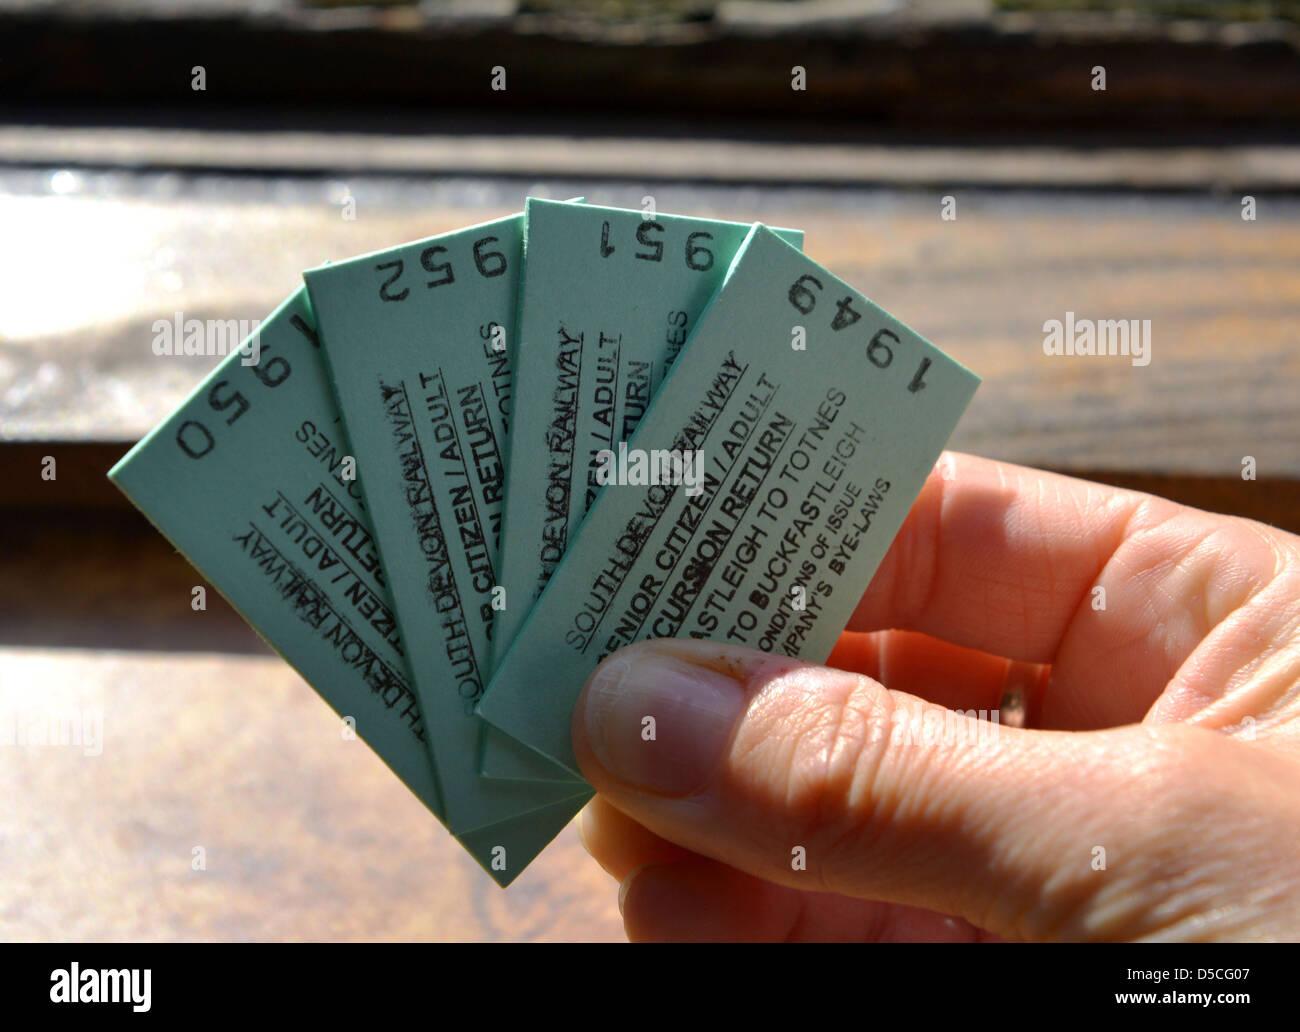 Tickets for The South Devon Railway that runs from Buckfastleigh, to Totnes in Devon, Britain, UK - Stock Image